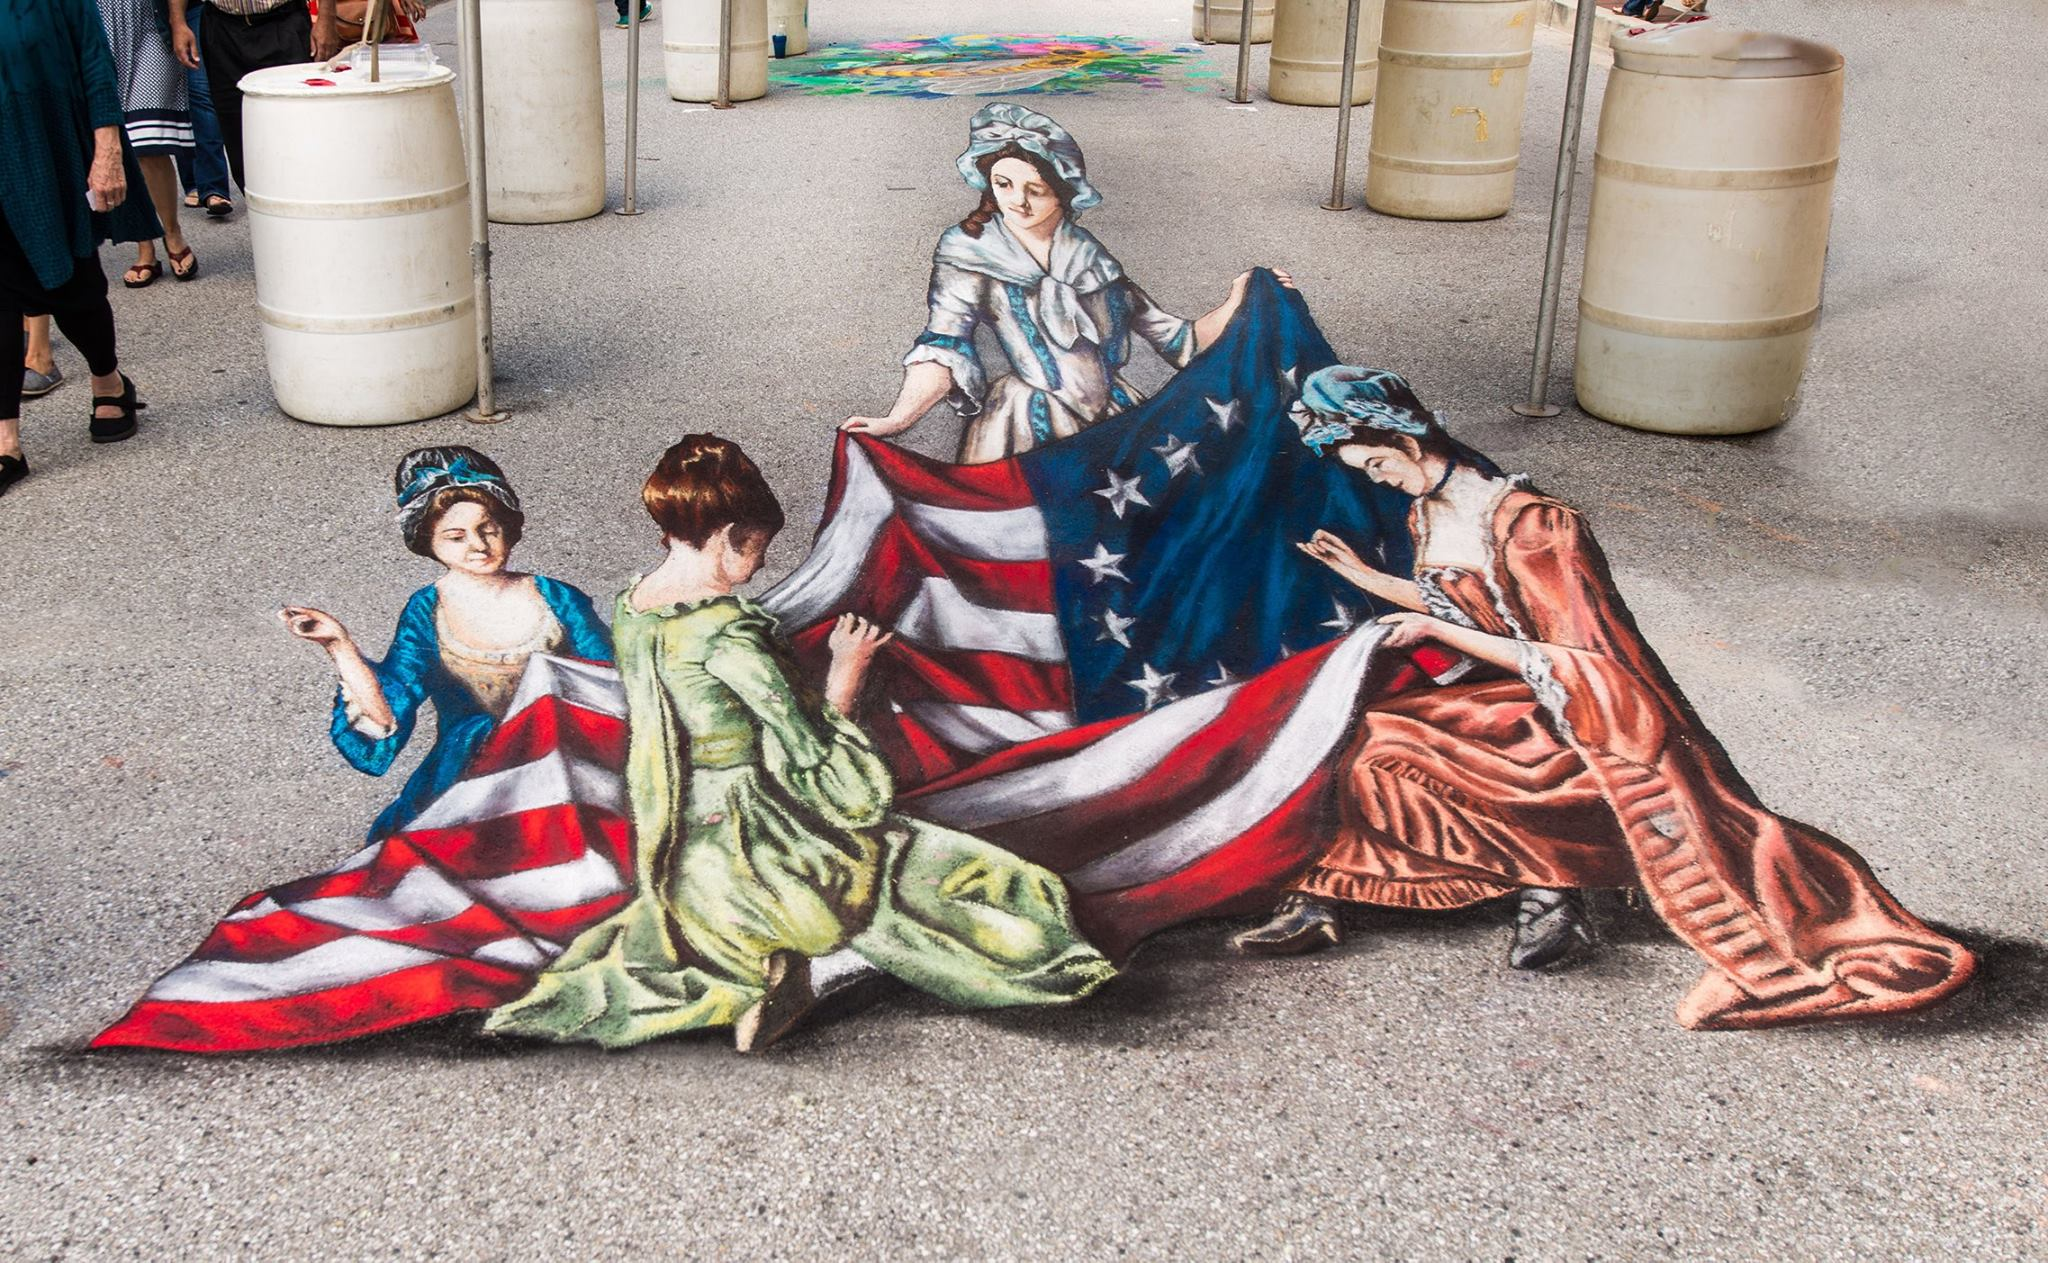 2017 Little Italy Madonnari Arts Festival, Baltimore, MD